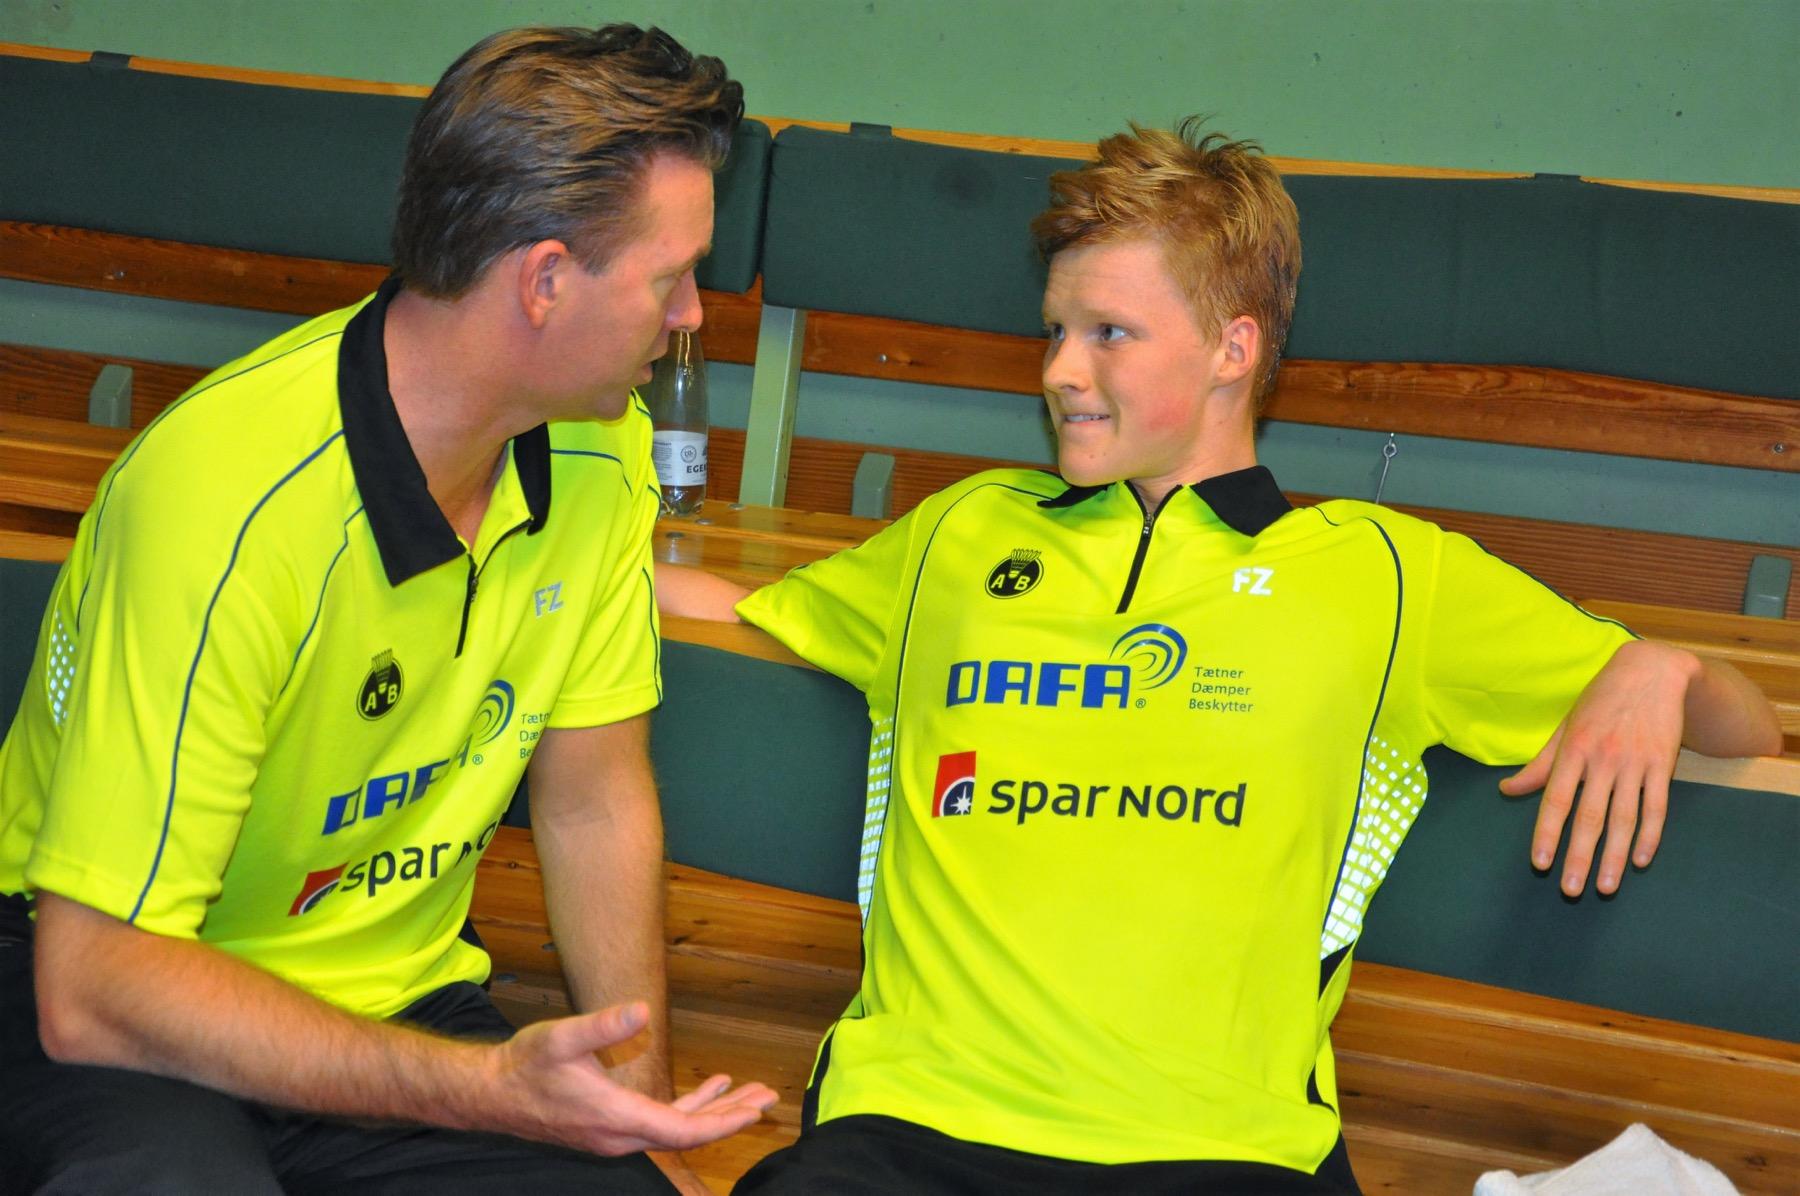 Hjemmedrengene svigtede i Aarhus Badmintonhal – BadmintonBladet